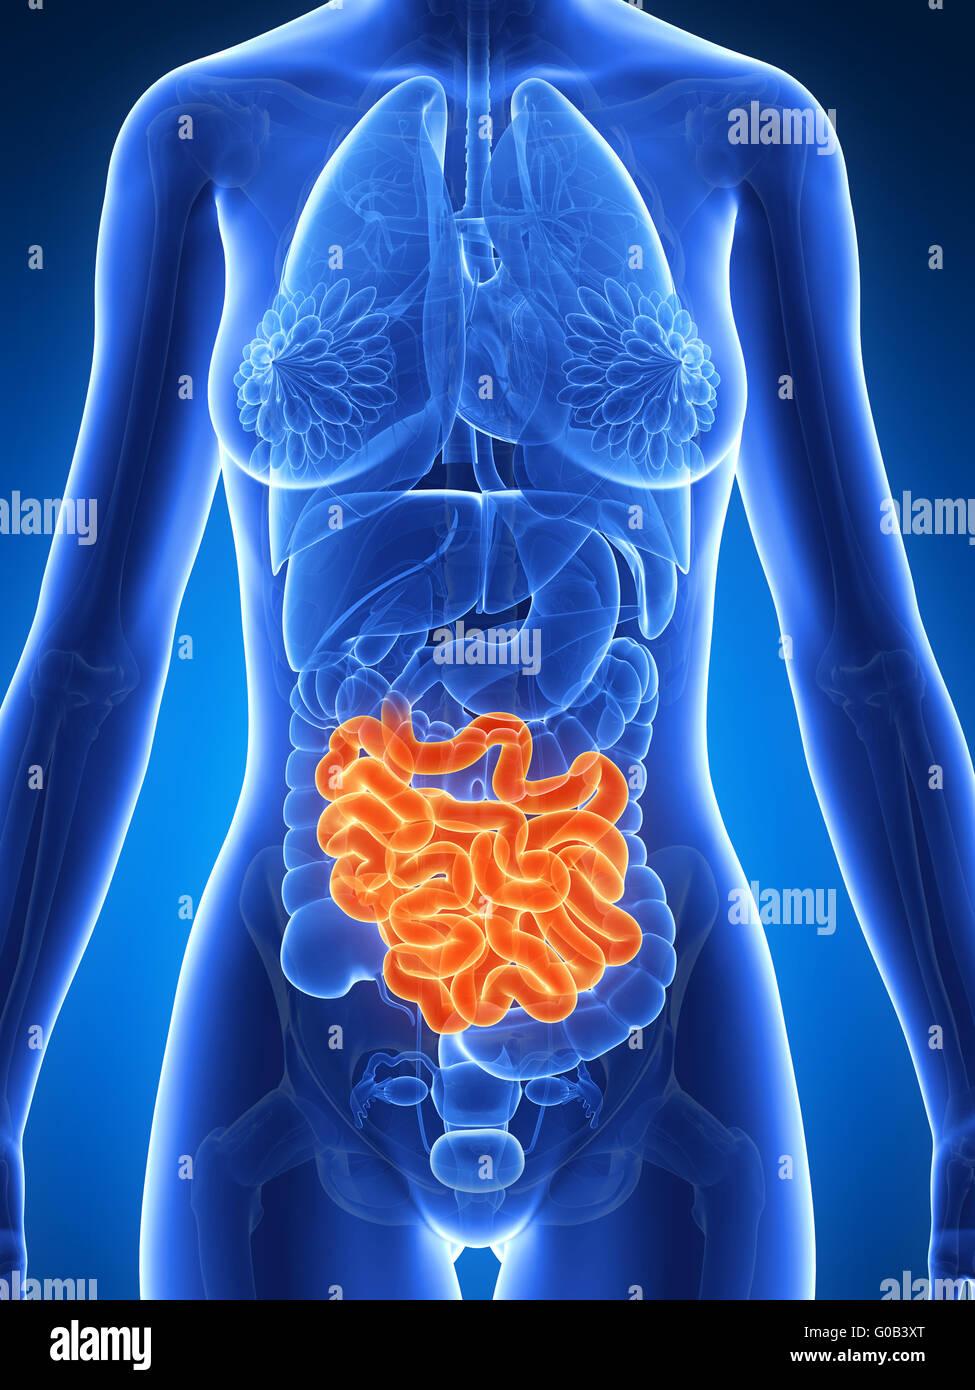 Inflamed Bowel Disease Stock Photos & Inflamed Bowel Disease Stock ...